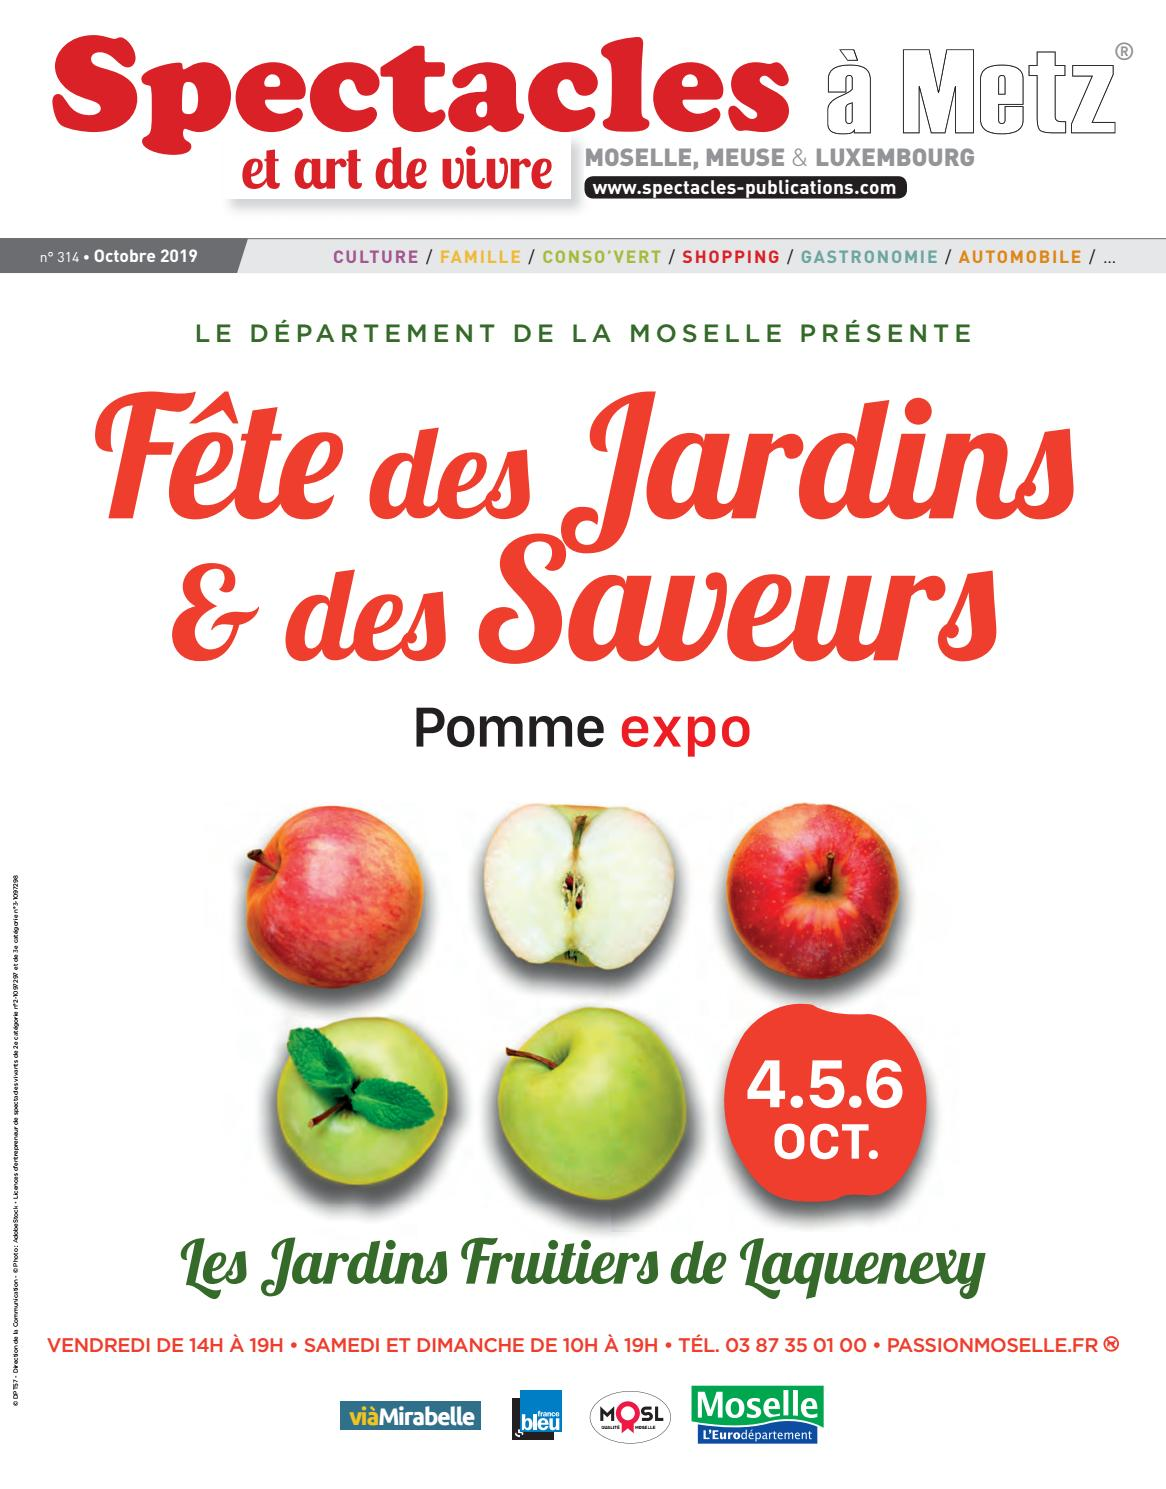 2019 By Spectacles Metz Octobre Publications N°314 eoCxBrdW